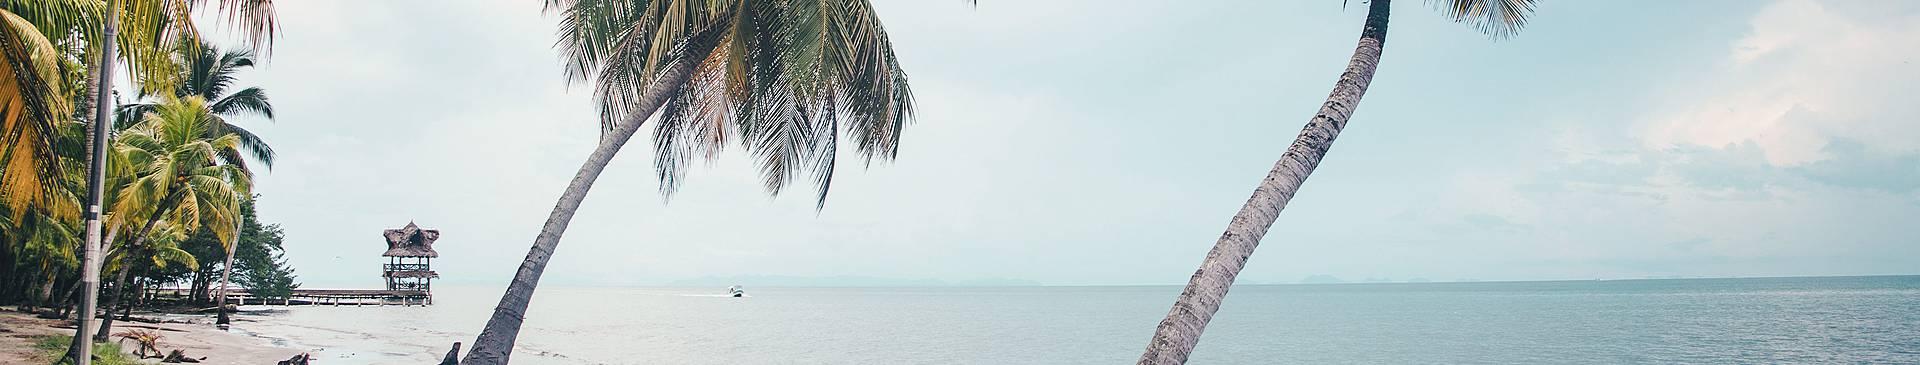 Voyage plage au Guatemala